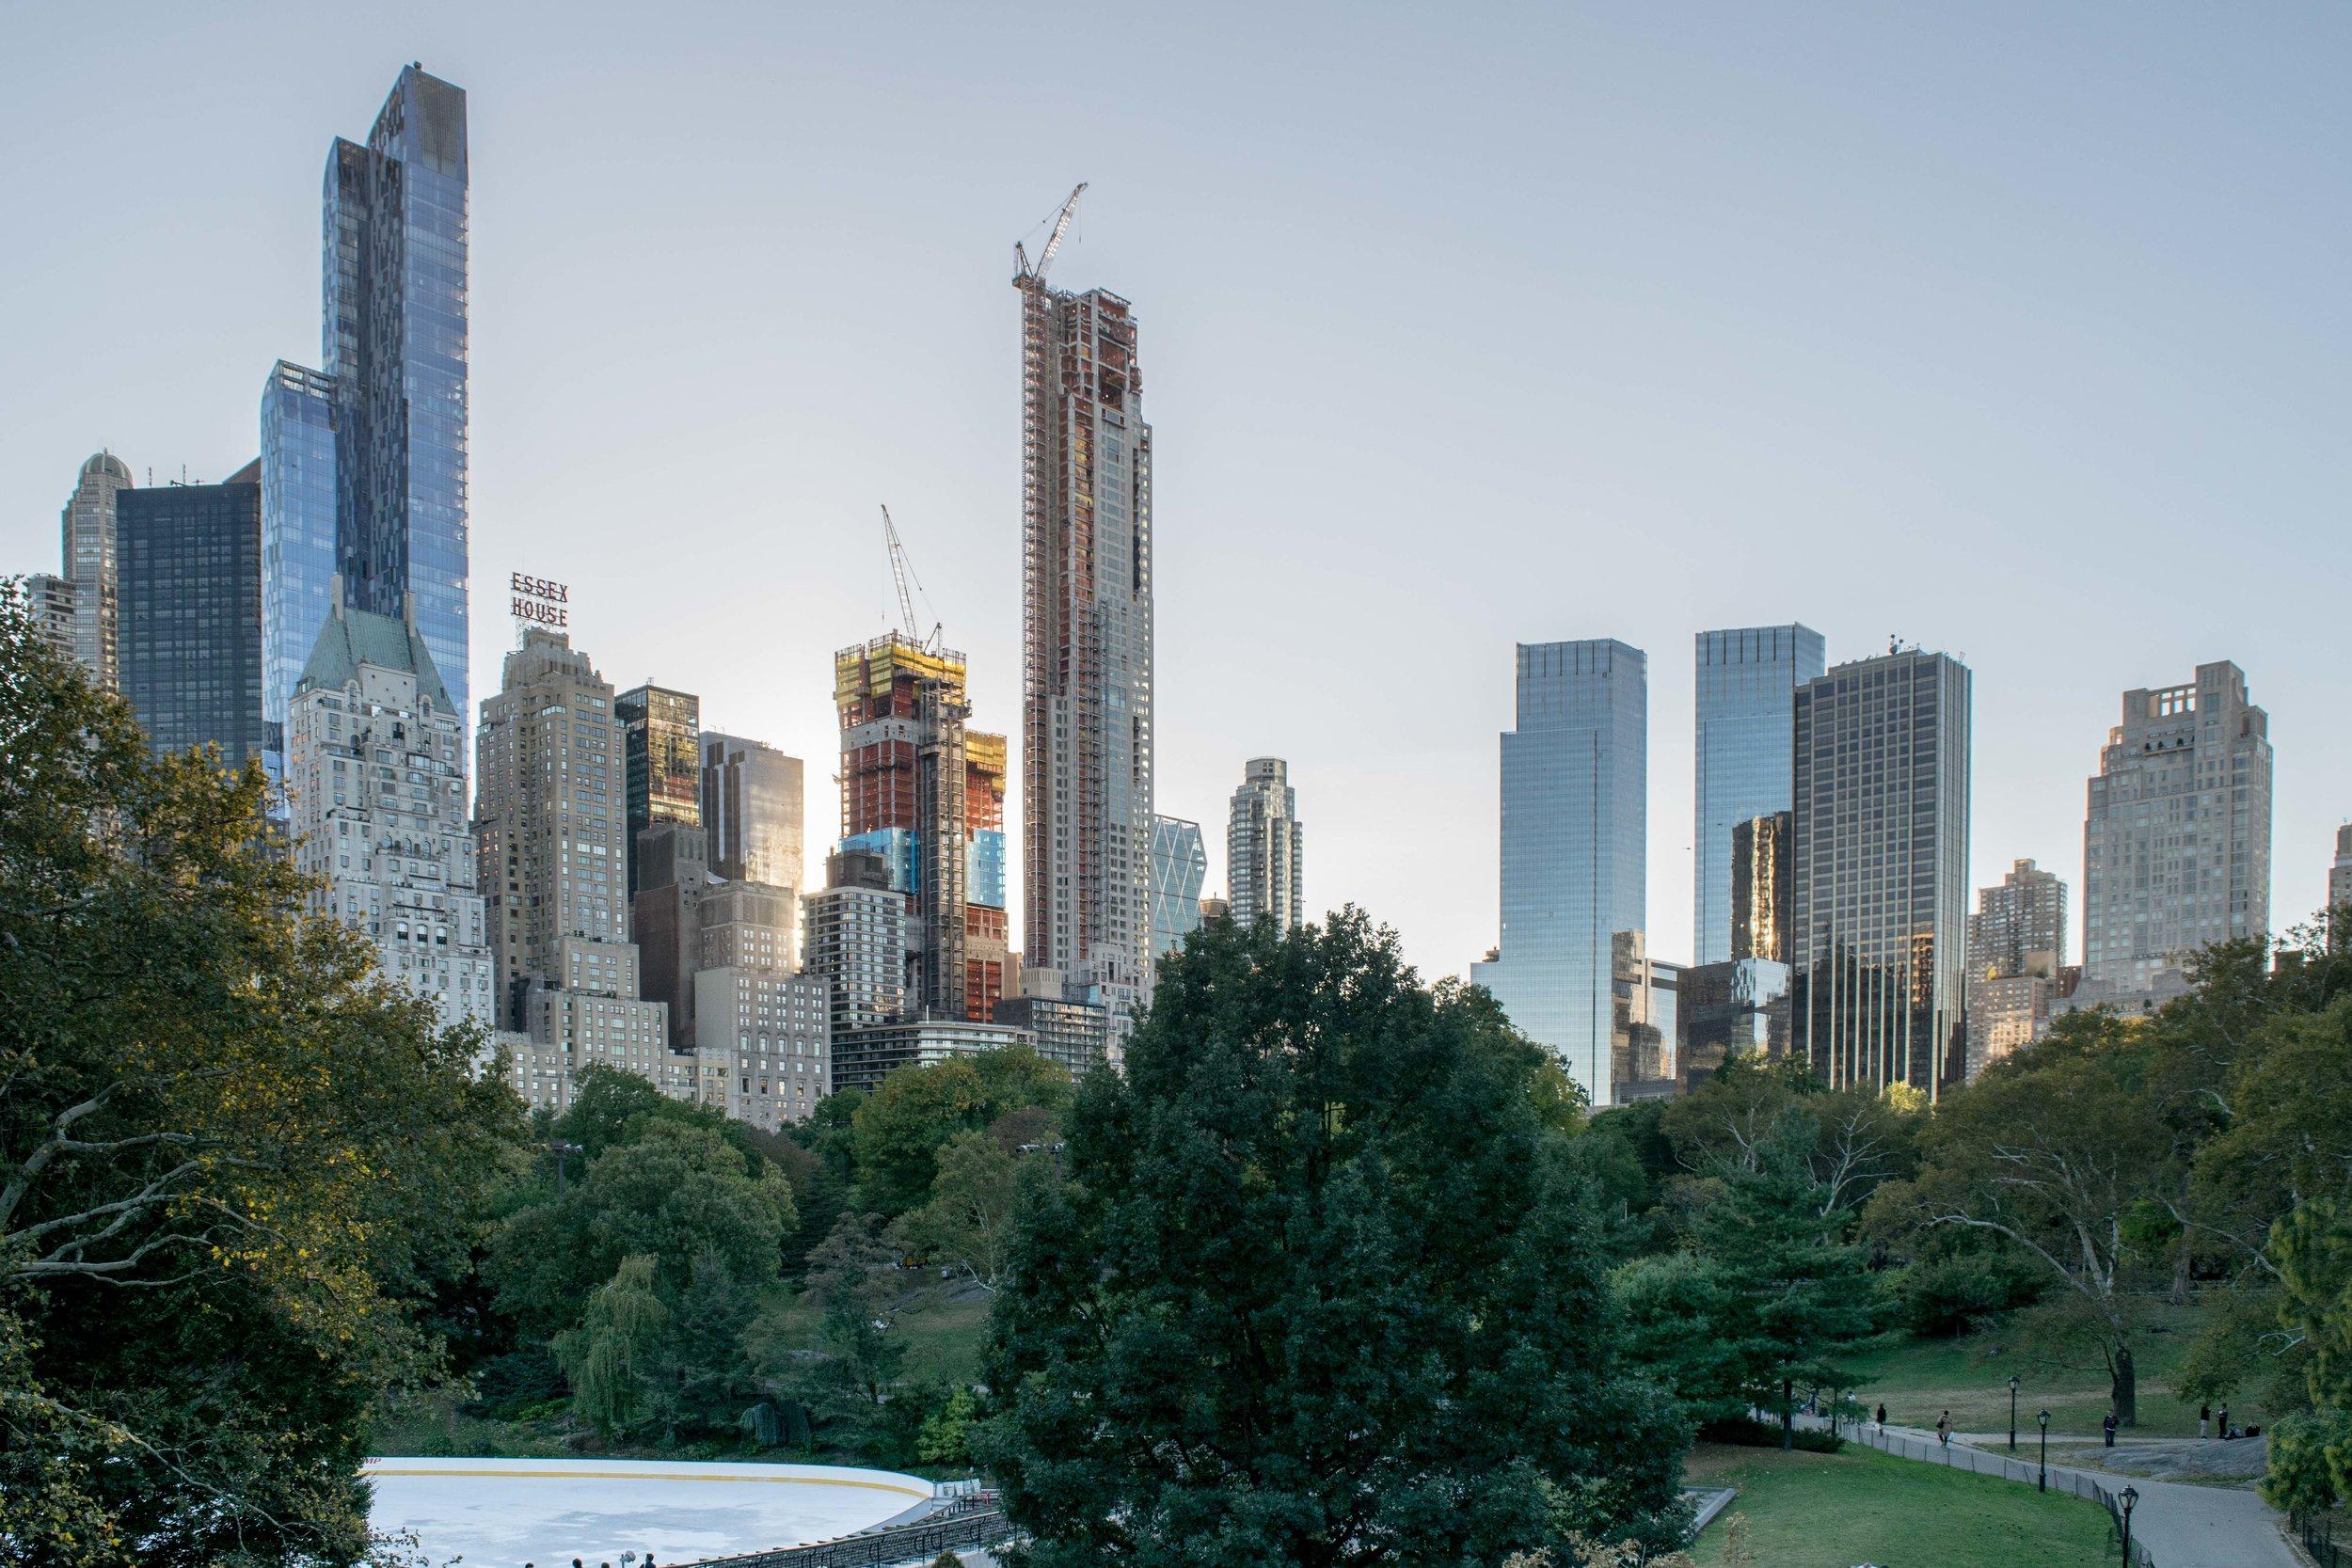 Manhattan skyline views from Central Park